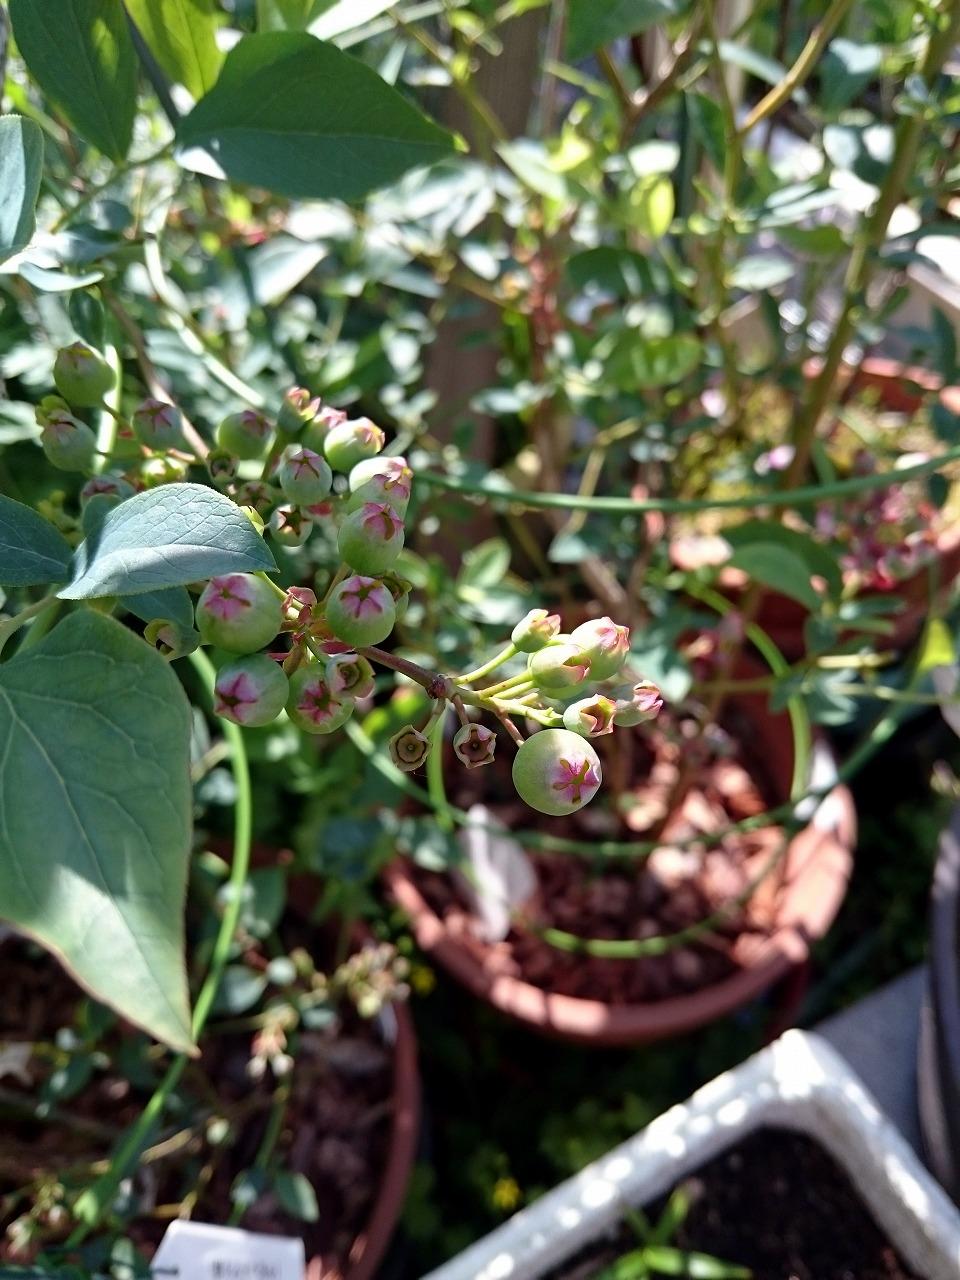 20150523-14_Blueberry-02.jpg